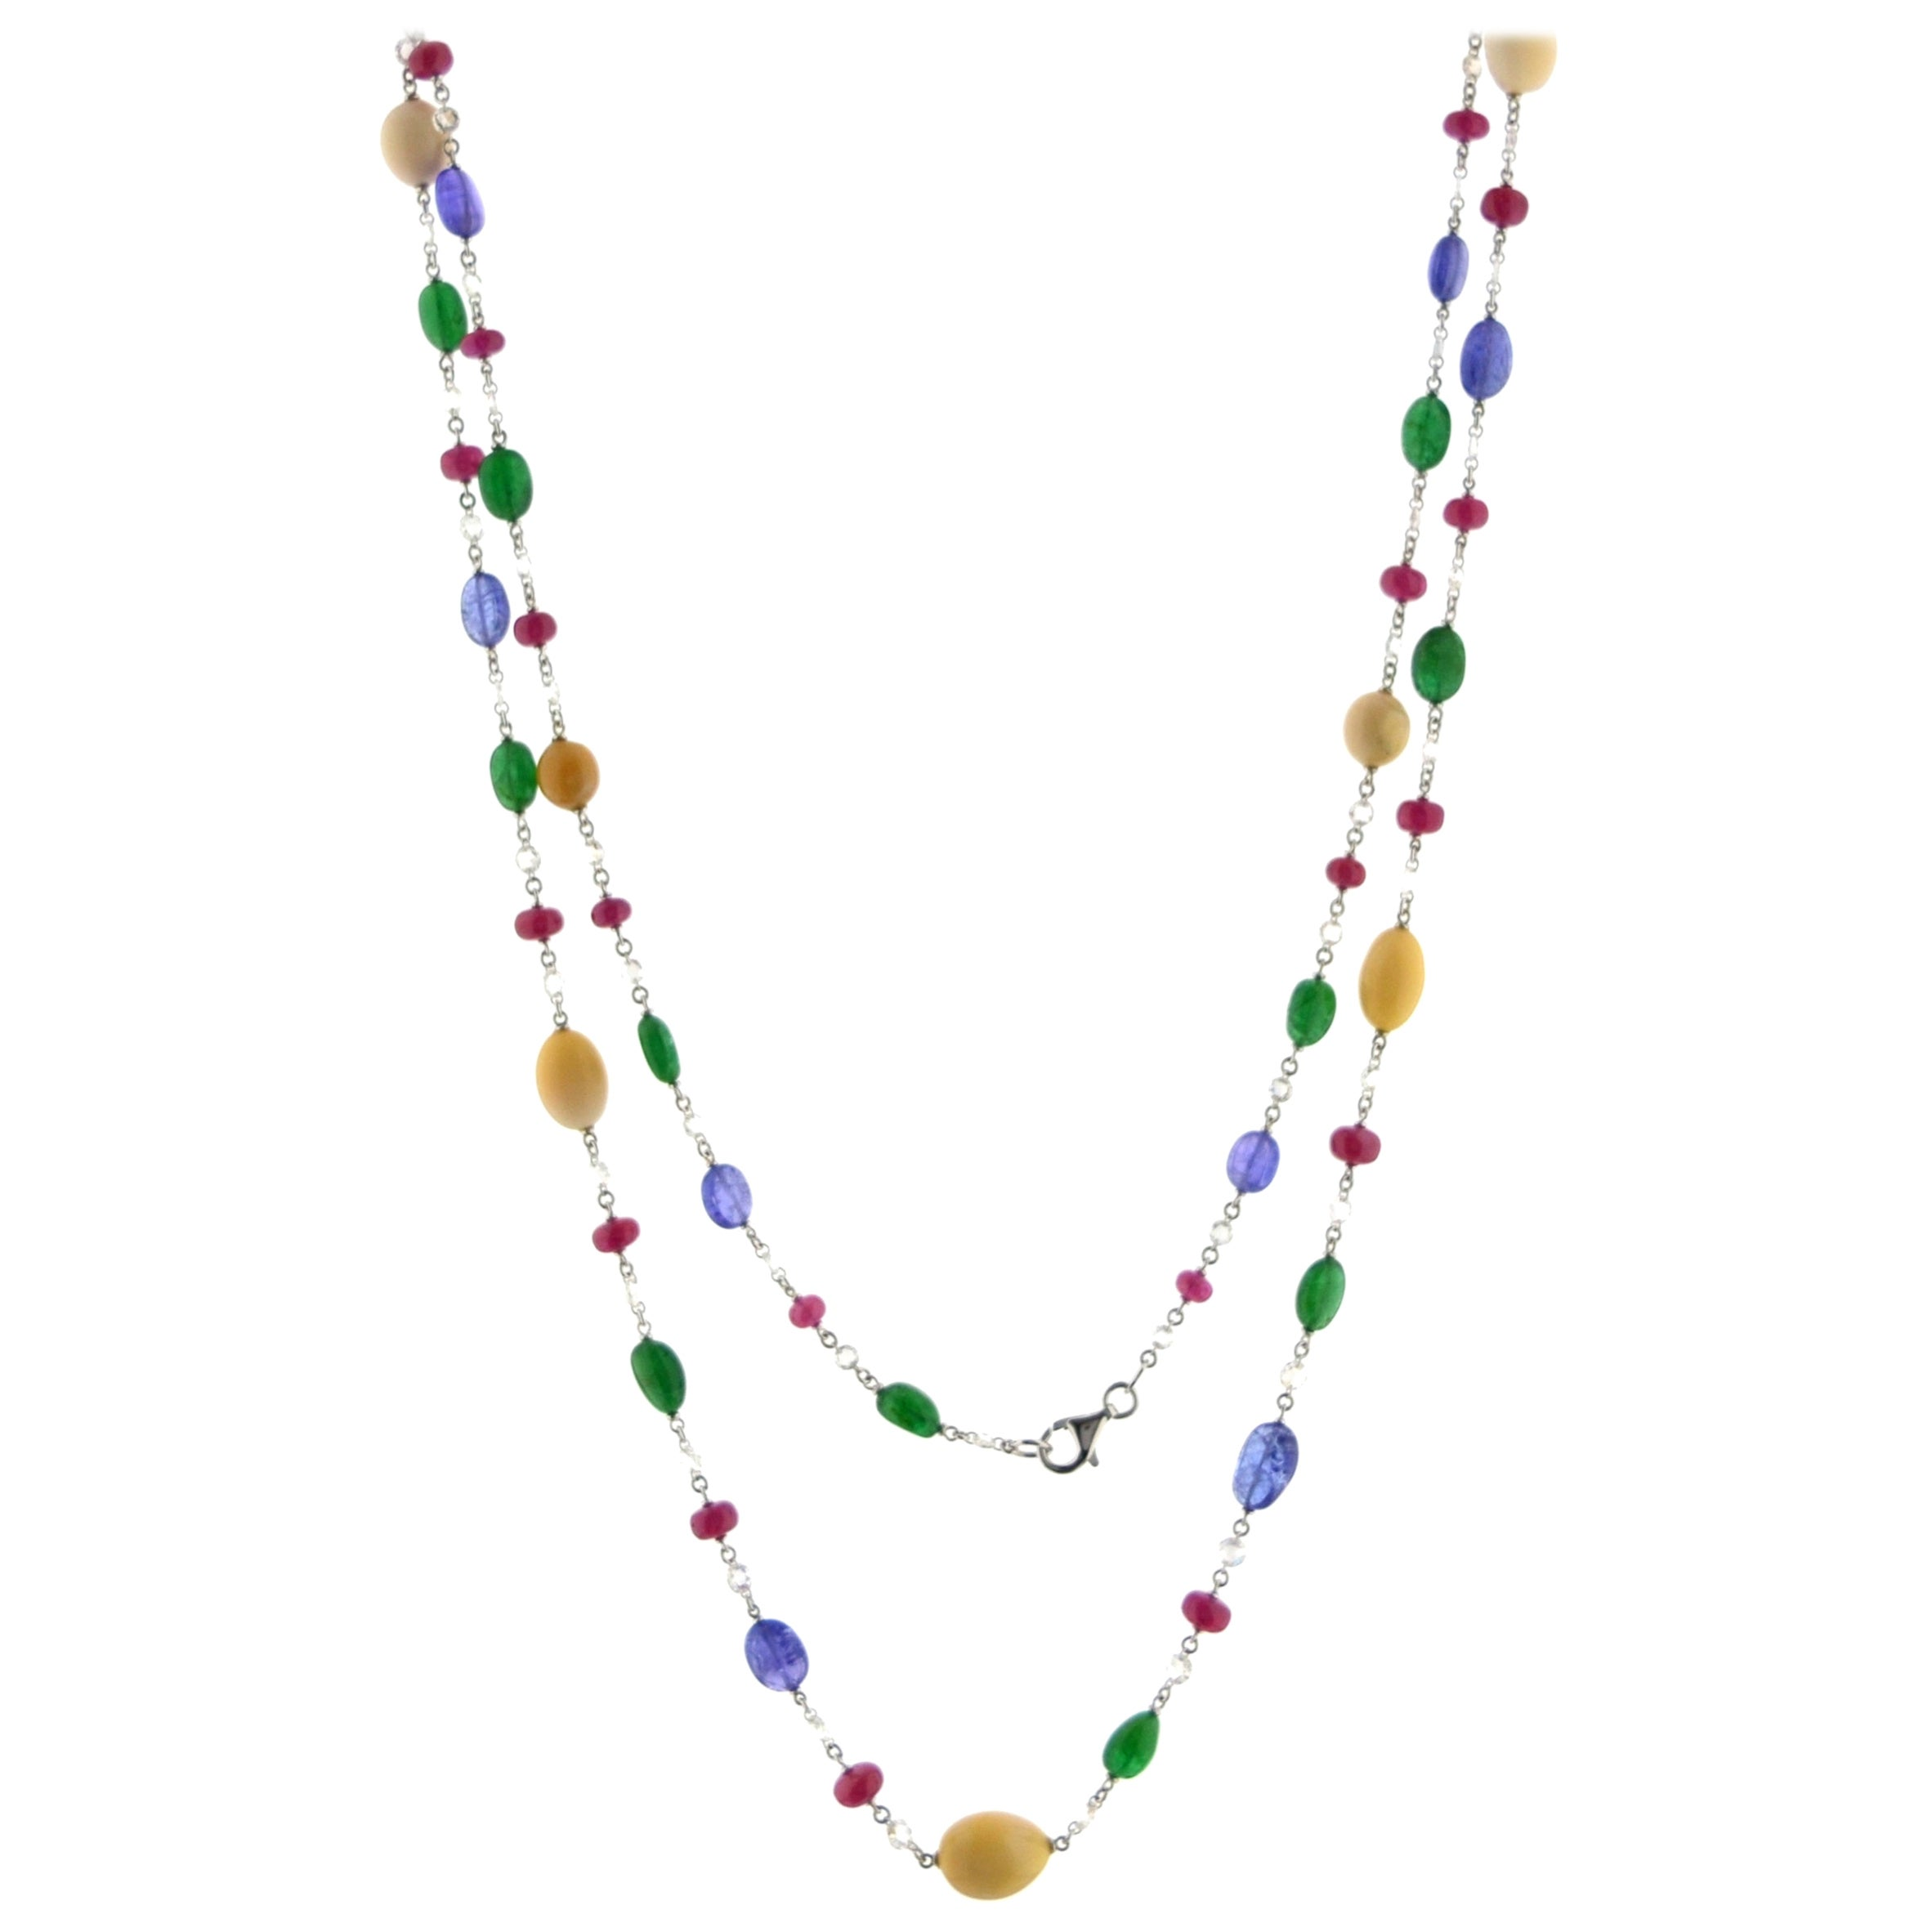 JR 18 Karat White Gold Rose Cut Diamond Multi-Color Necklace